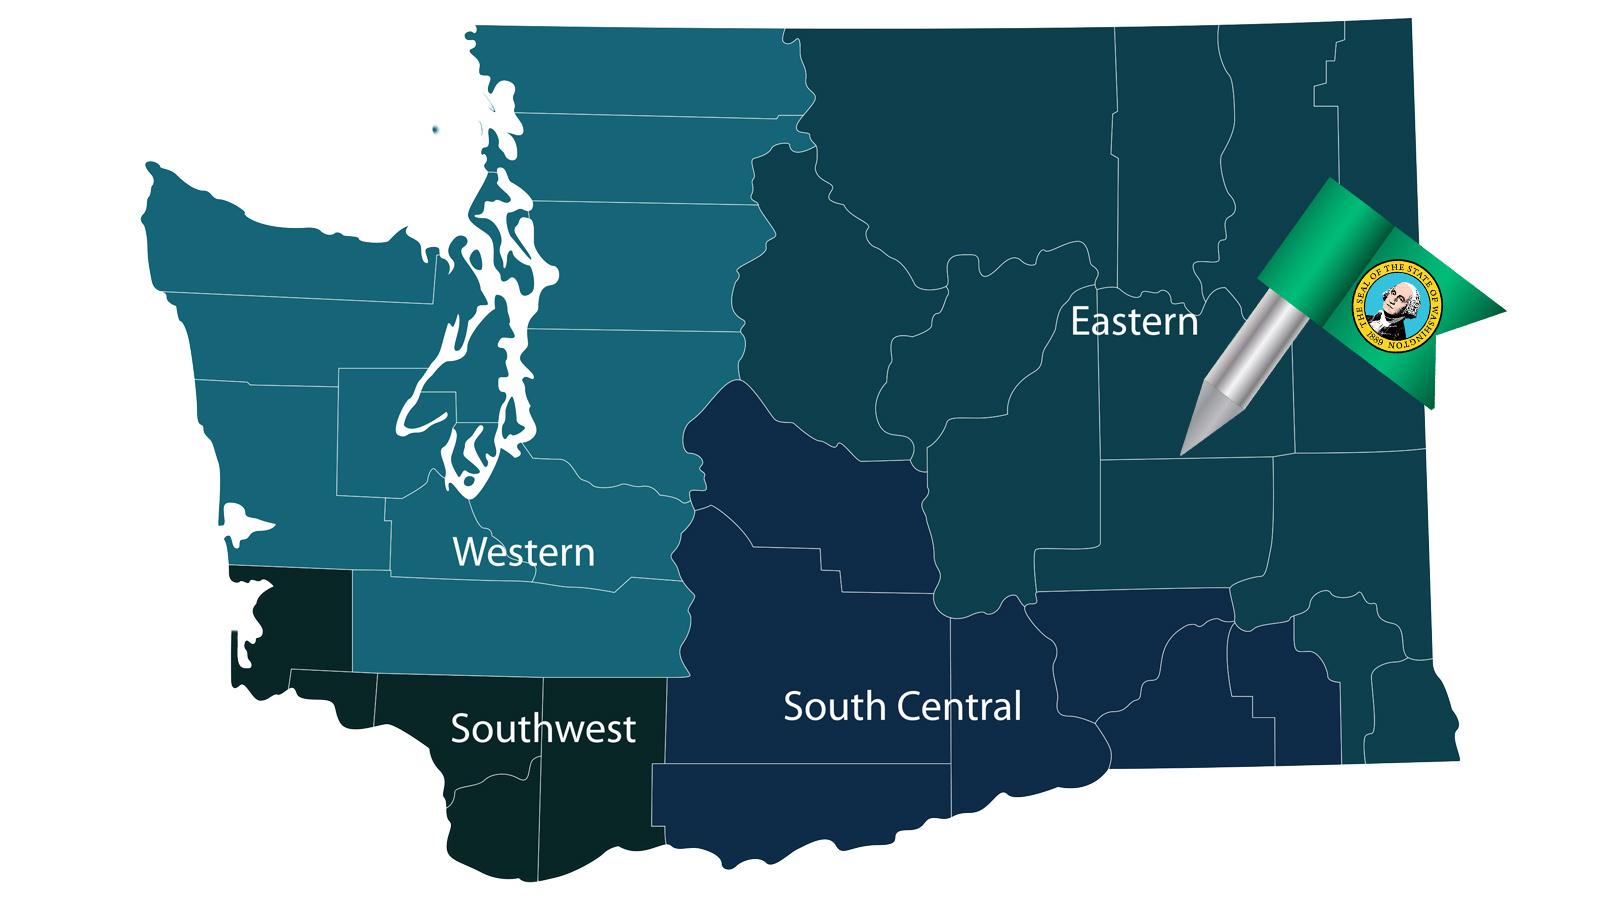 Map of Washington with pin in Eastern Washington region